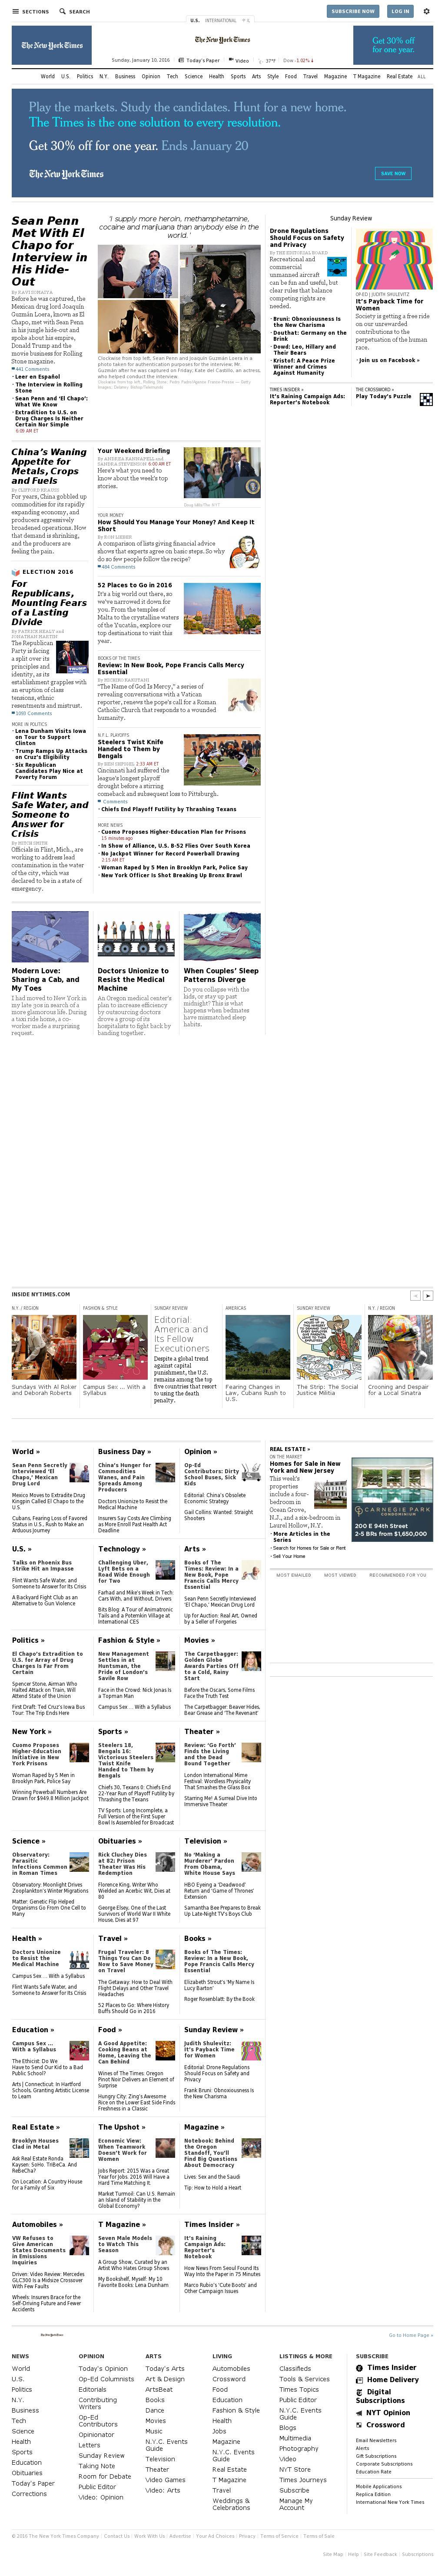 The New York Times at Sunday Jan. 10, 2016, 1:15 p.m. UTC